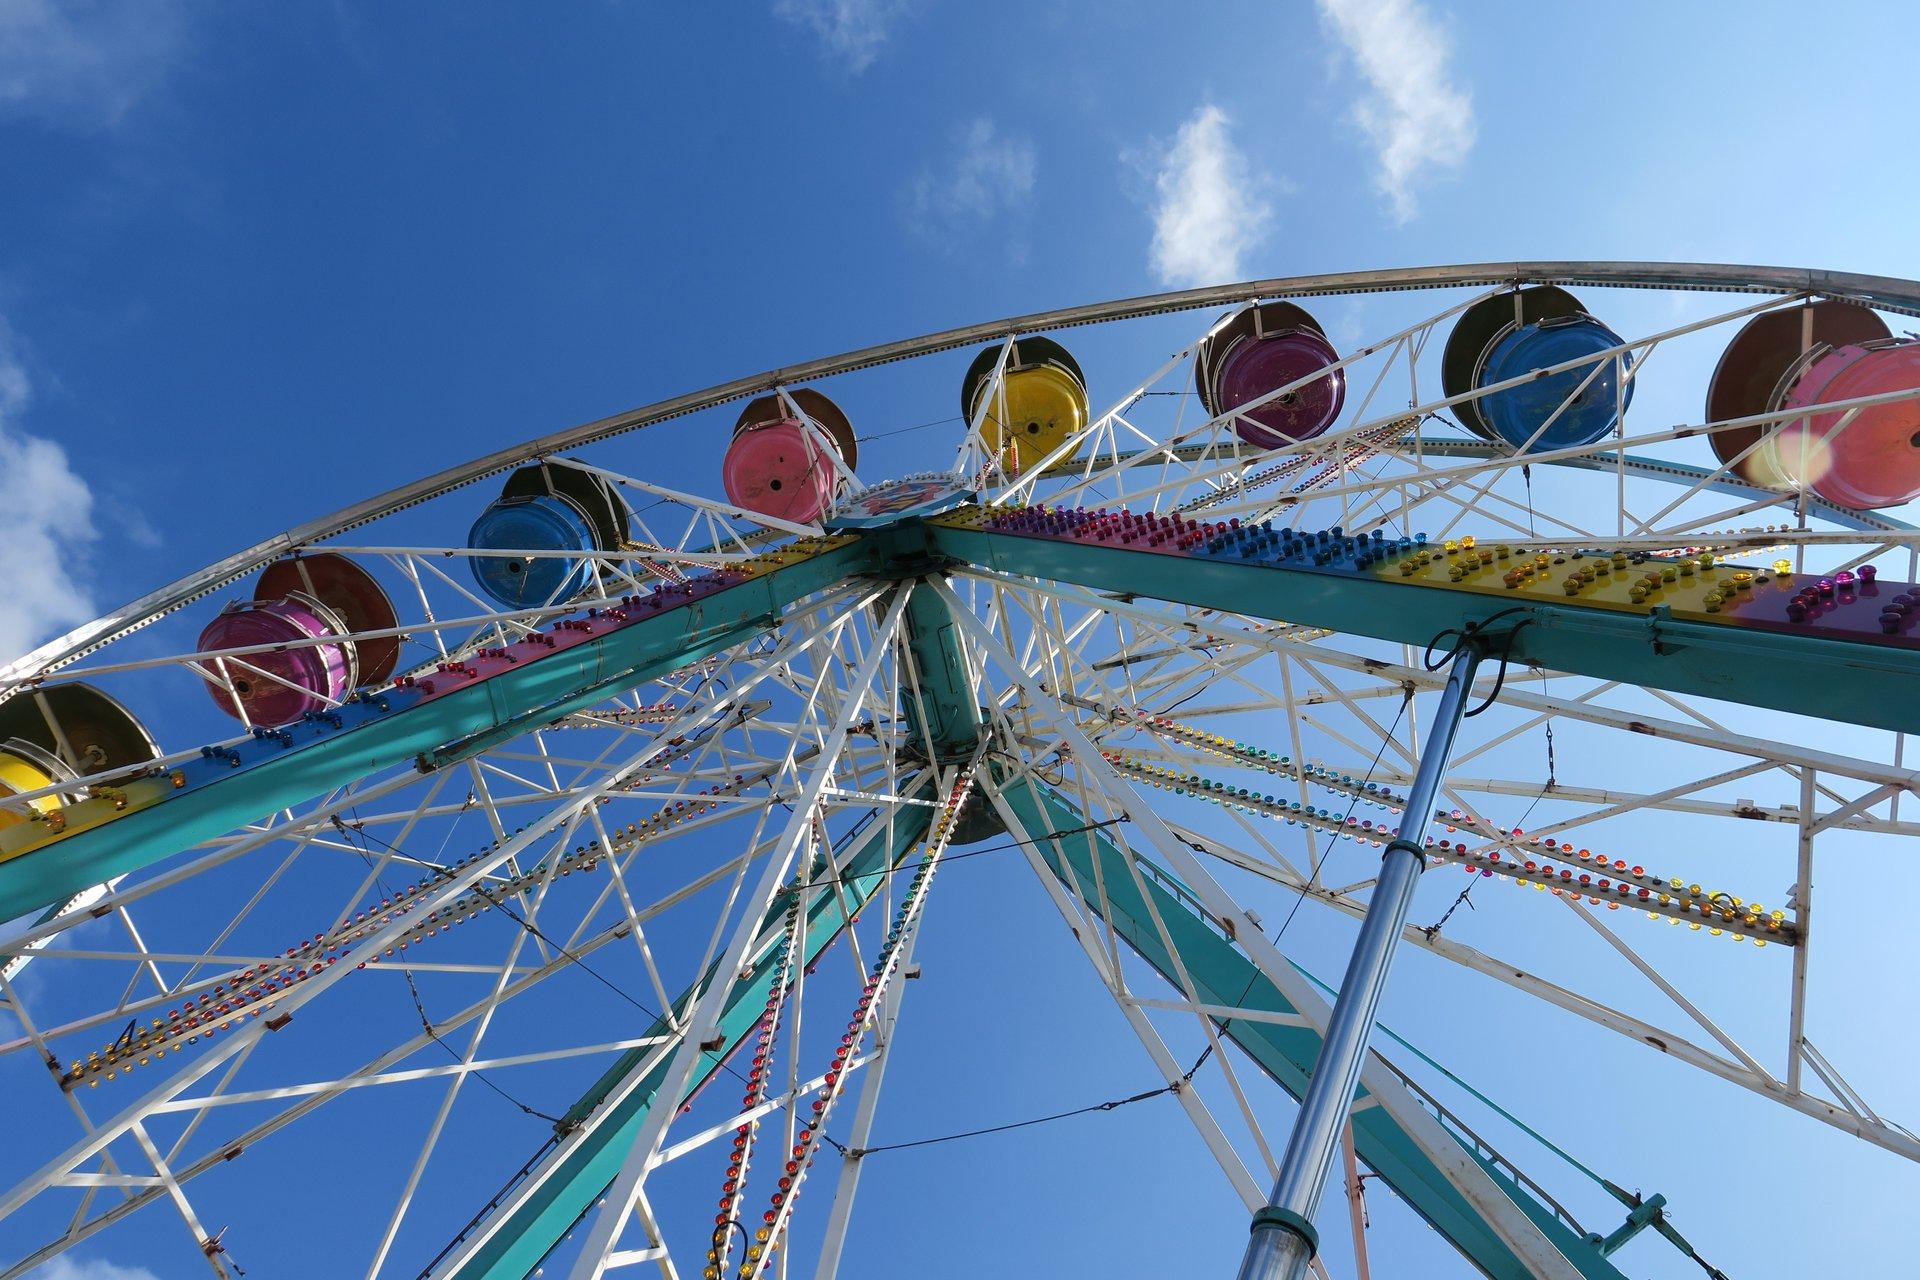 Skowhegan State Fair in Maine 2020 - Best Time